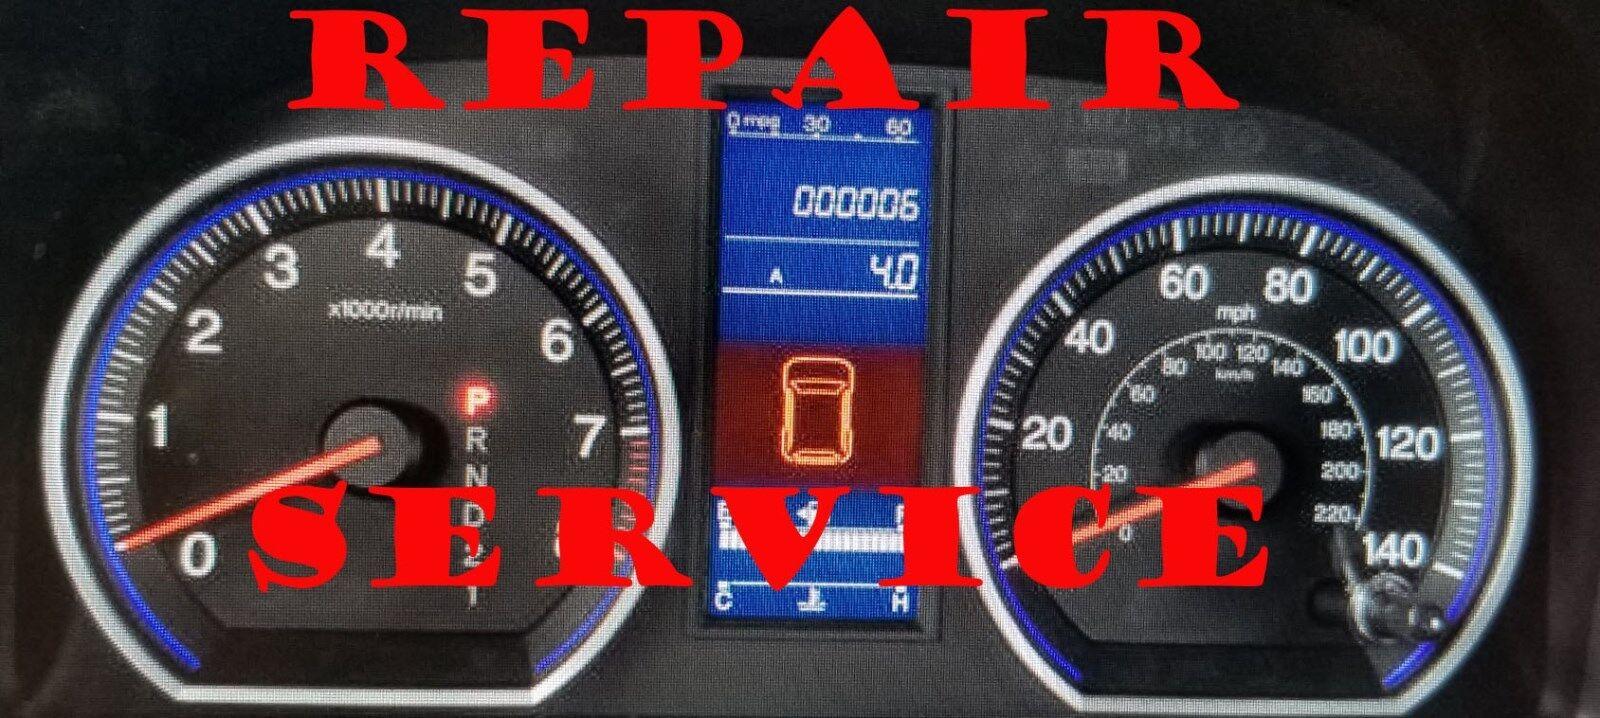 2010 11 Honda CRV SE LX INSTRUMENT CLUSTER SOFTWARE & ODOMETER CALIBRATION SERV